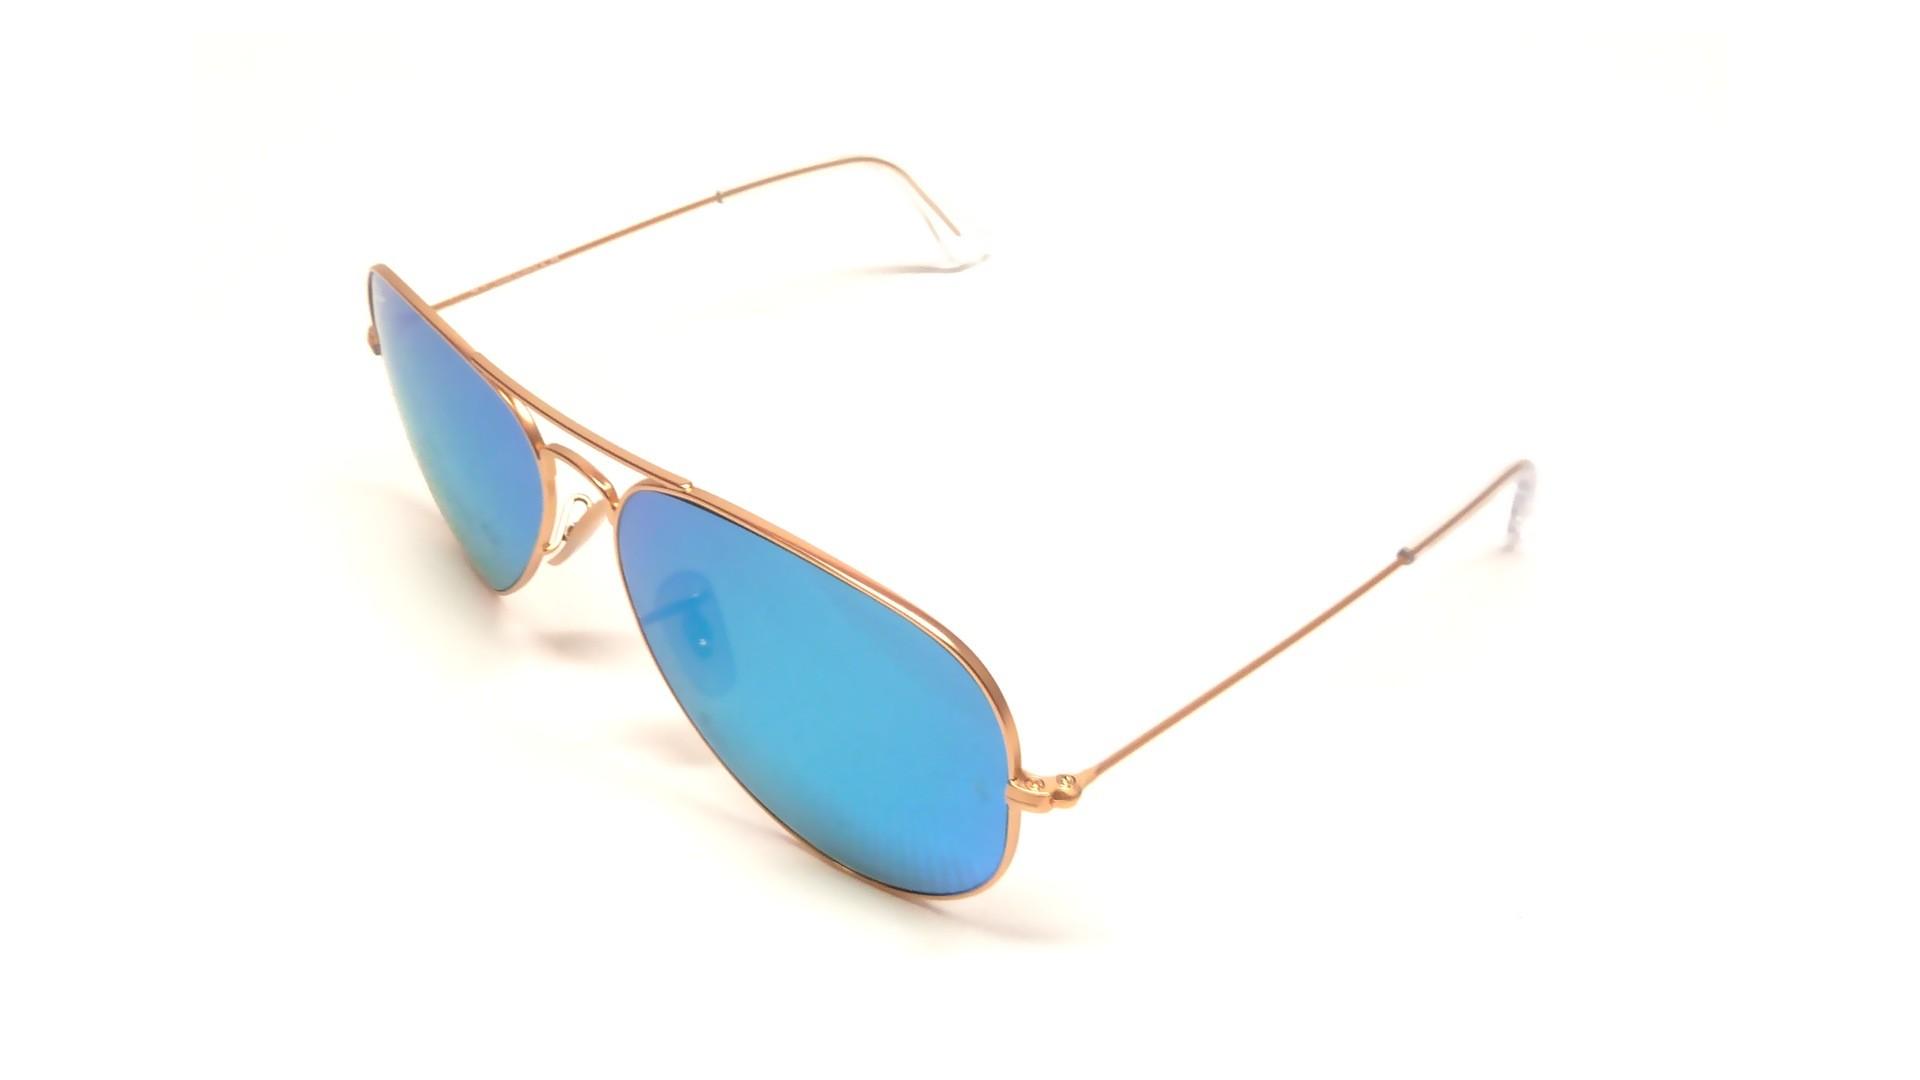 Lunettes de soleil ray ban aviator femme miroir argoat for Lunettes de soleil ray ban aviator miroir